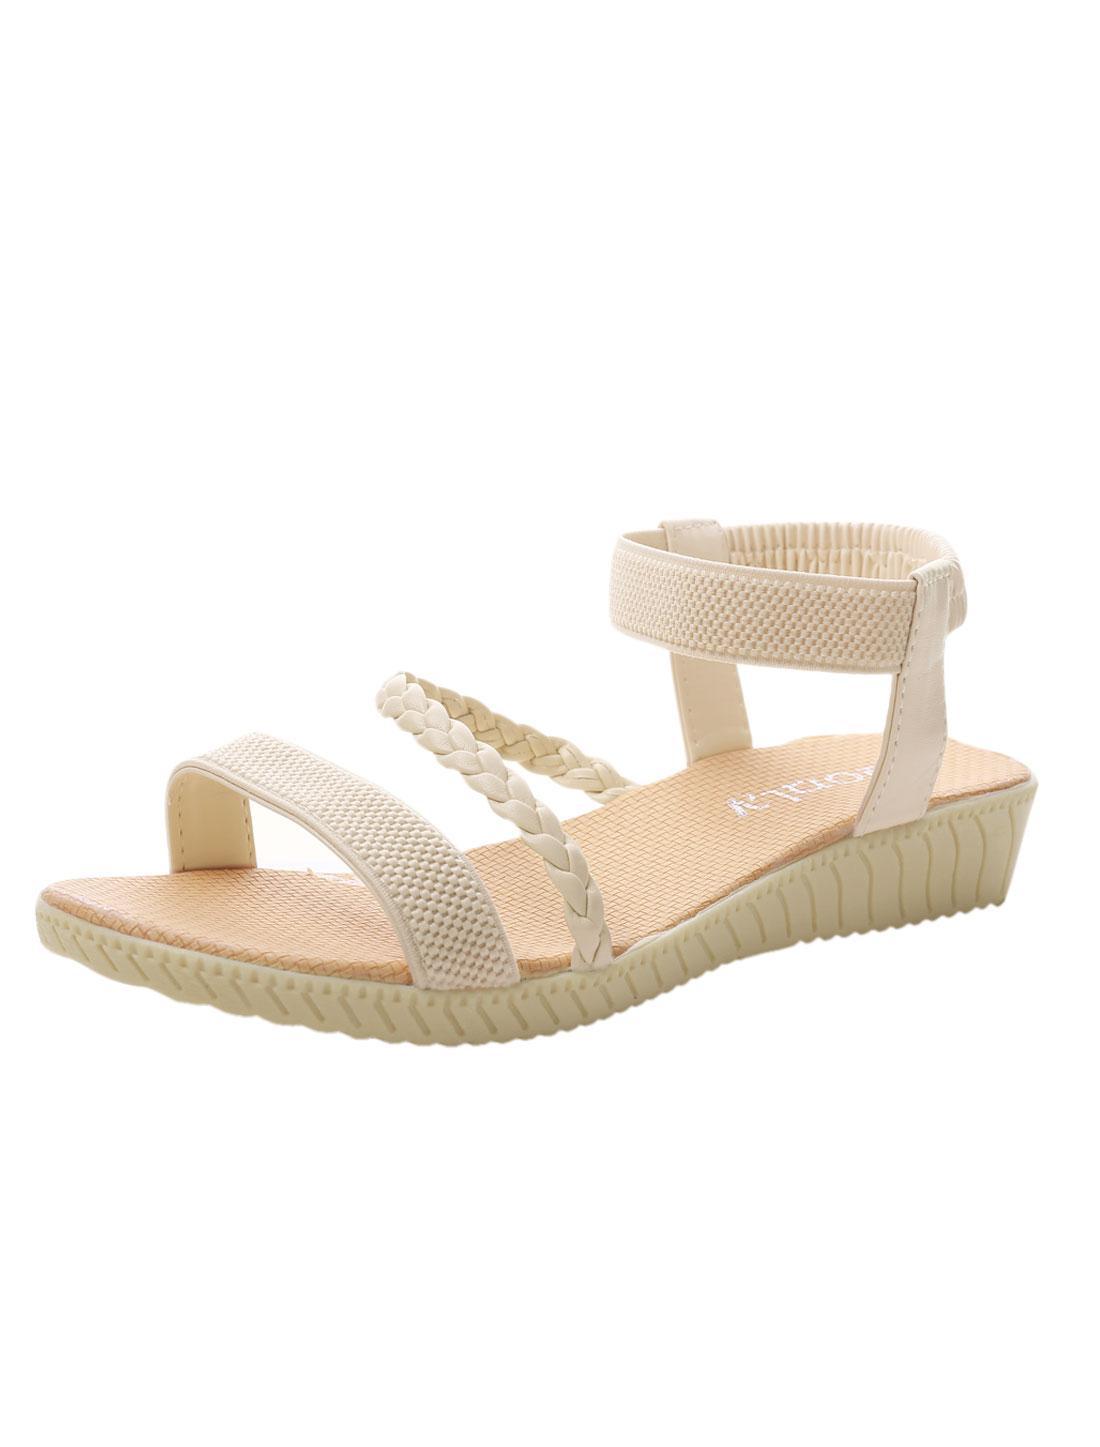 Women Elasticed Strap Panel Open Toe Summer Sandals Beige US 5.5